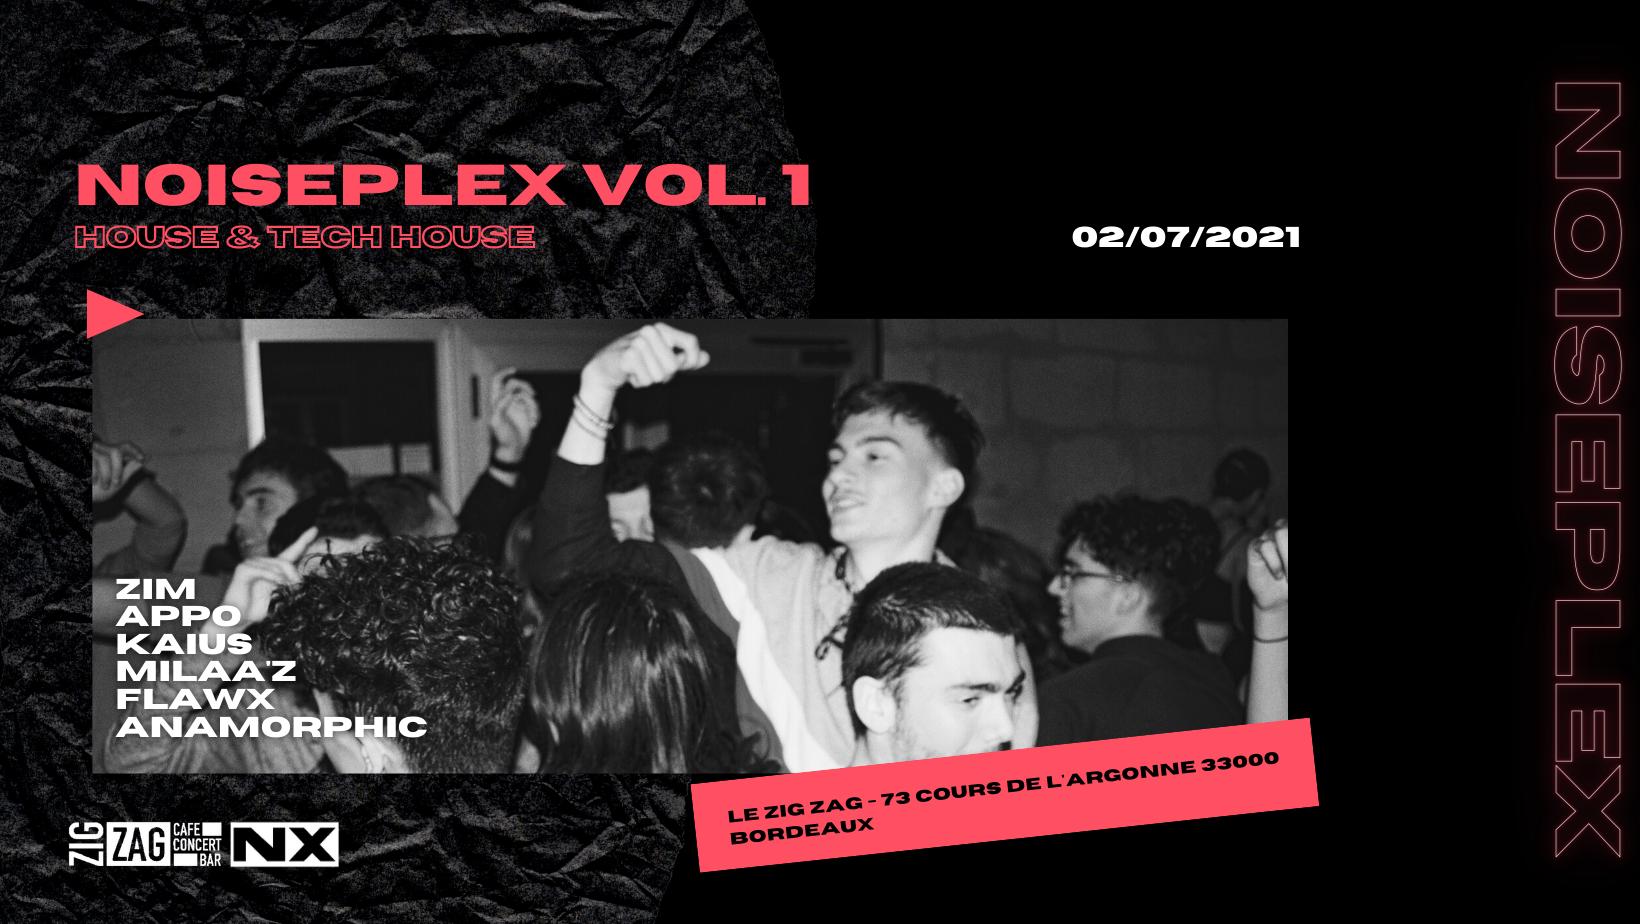 Noiseplex Vol. 1